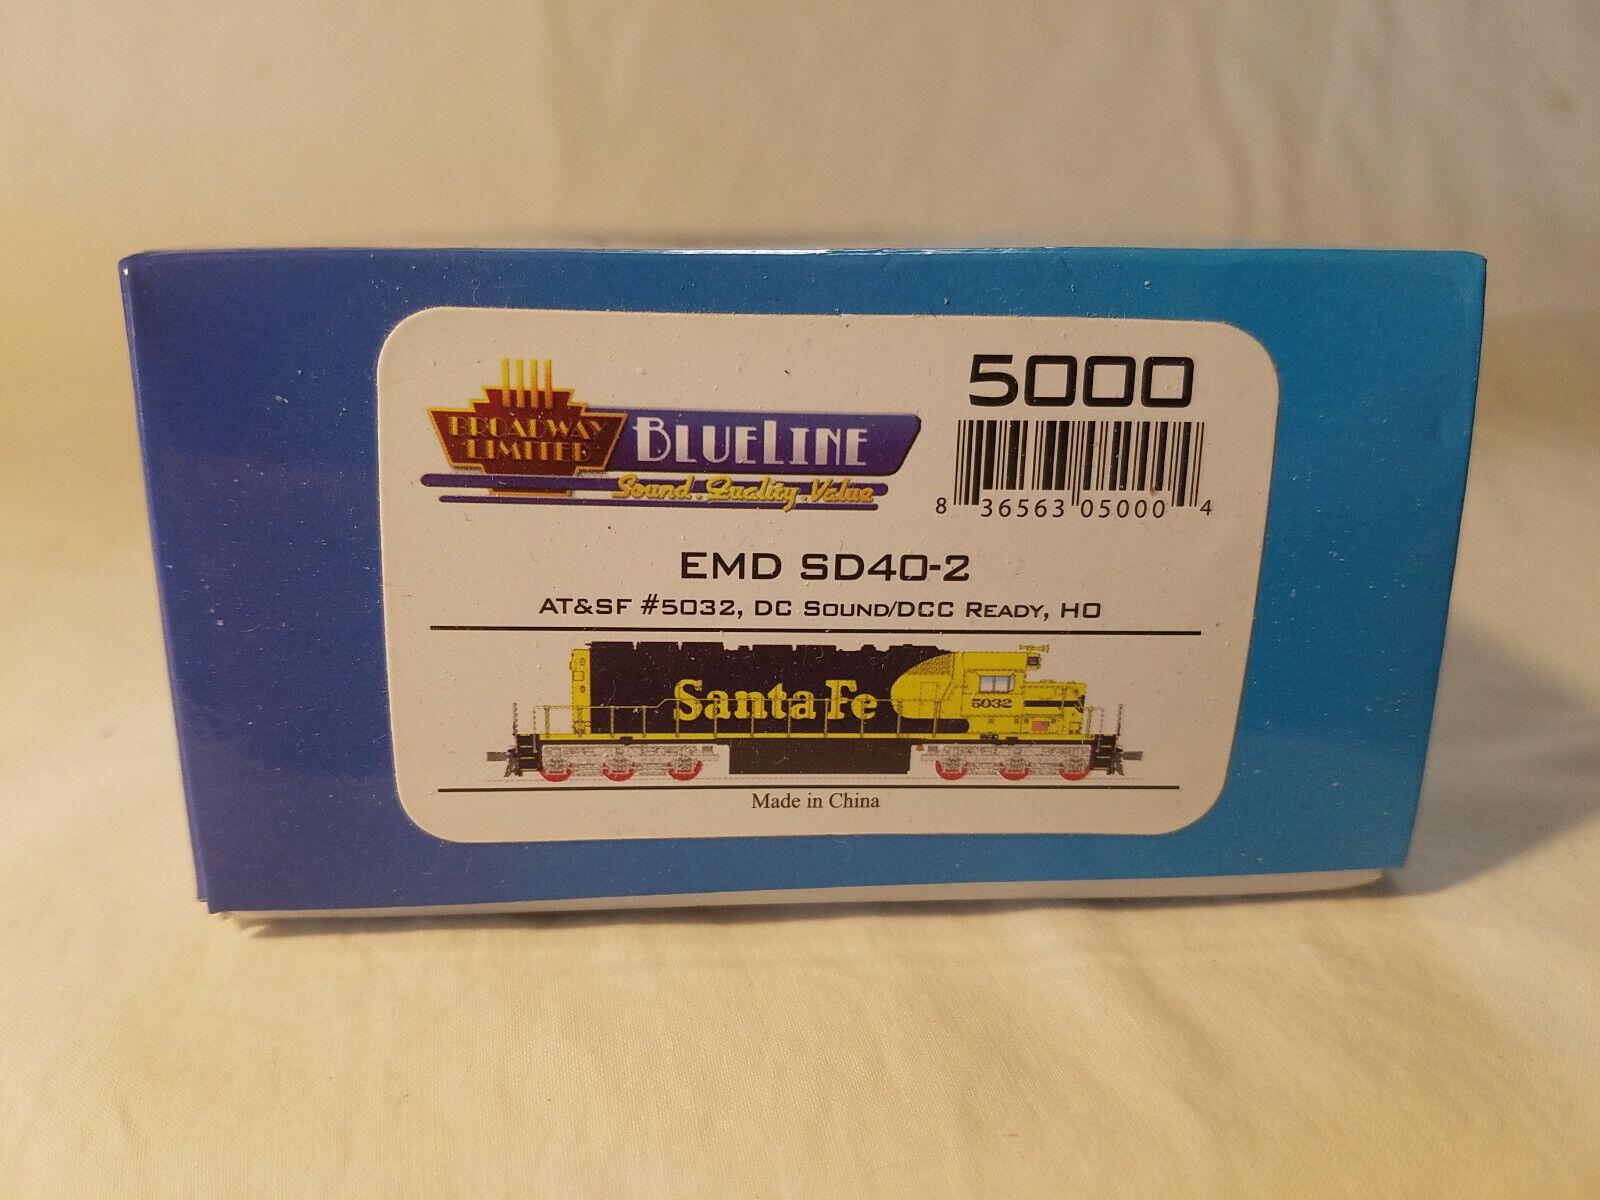 blueeLine - 5000 (Walthers 187-5000) - EMD SD40-2 LH - AT&SF